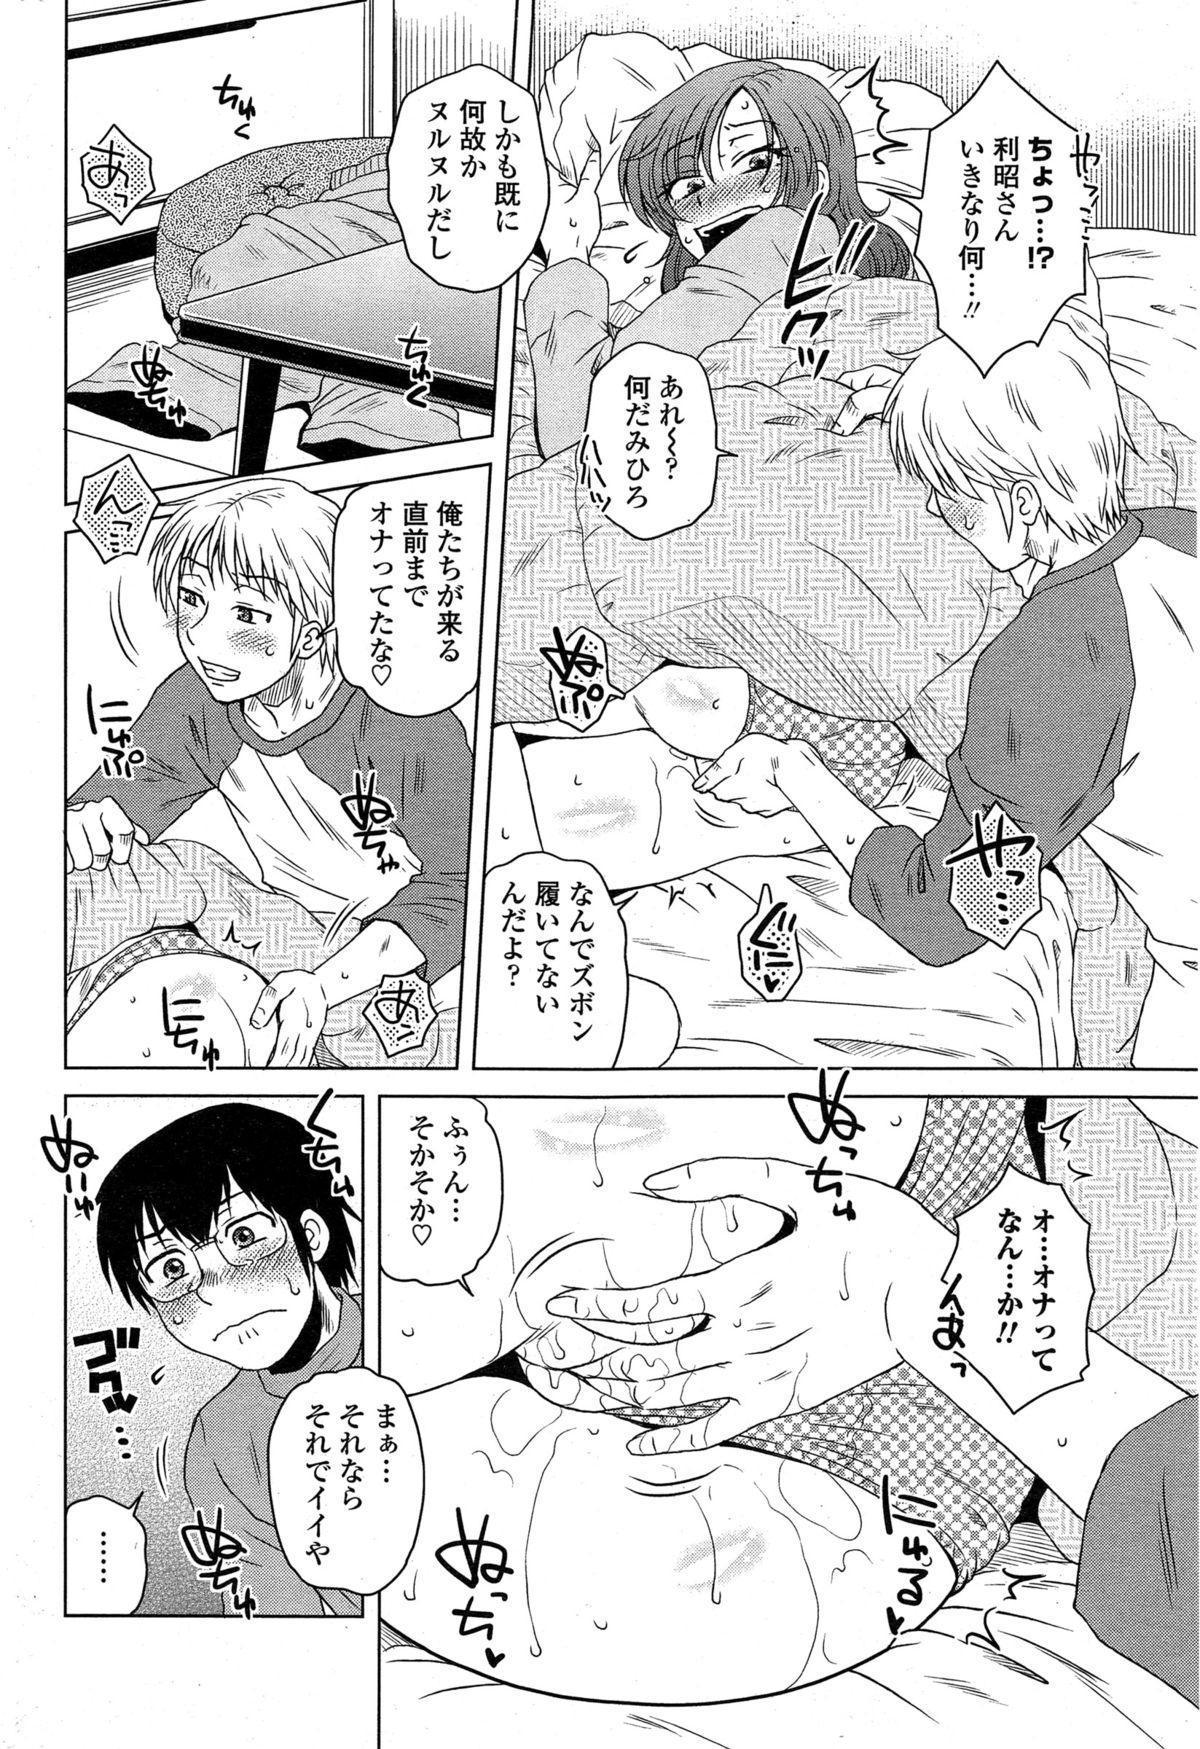 [Kurumiya Mashimin] Mikkai-chuu ni Tsuki Ch.1-6 85